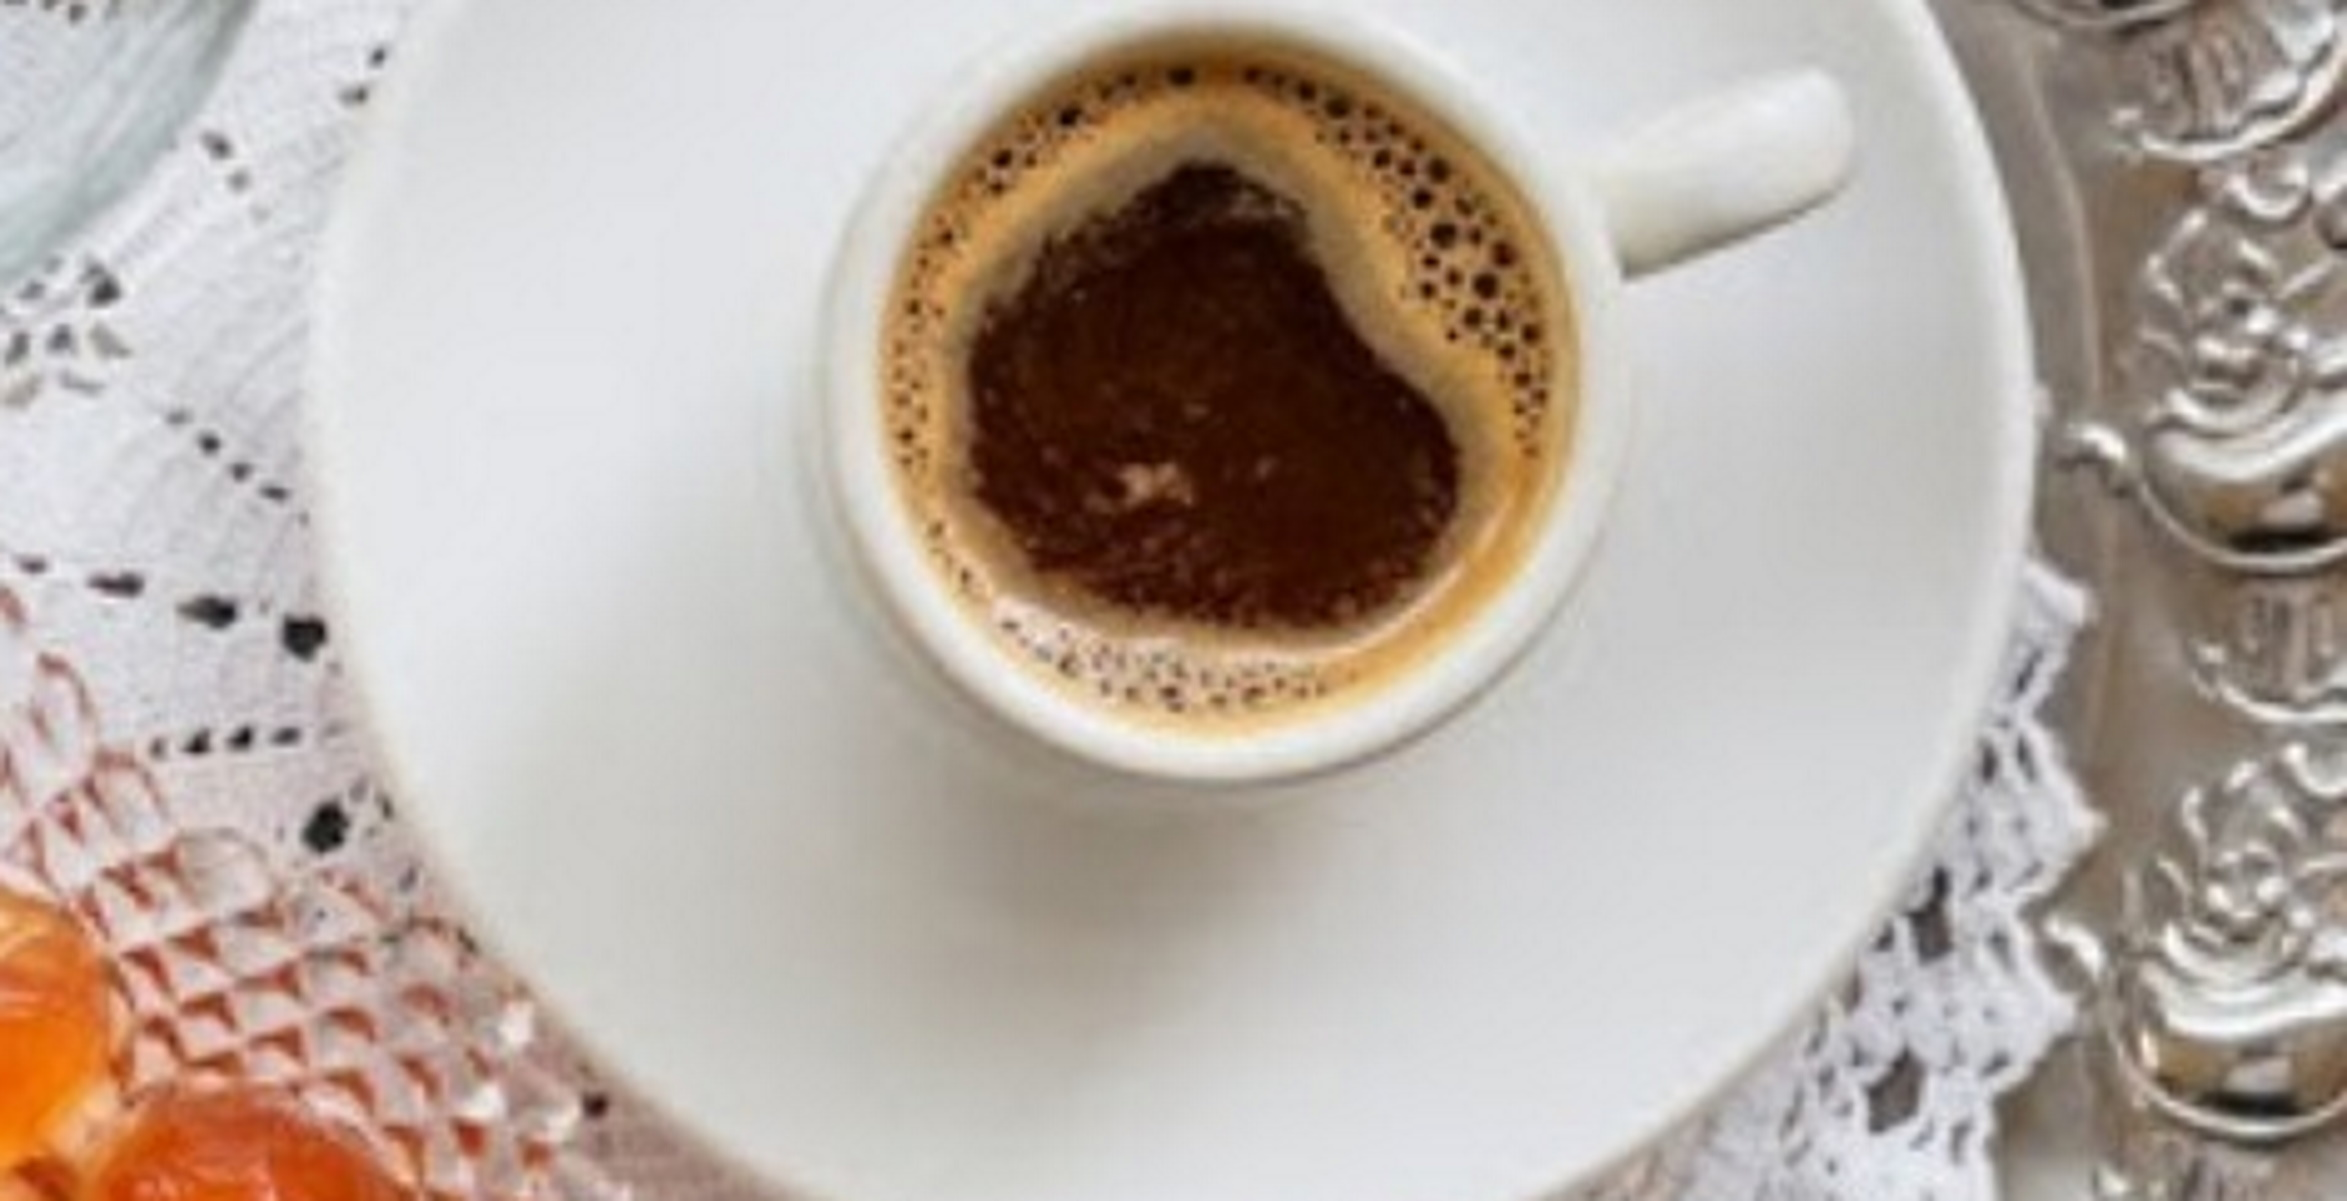 Lockdown – Κρήτη: «Πικρός» καφές – 3.000 ευρώ πρόστιμο επειδή άνοιξε και σέρβιρε πελάτες